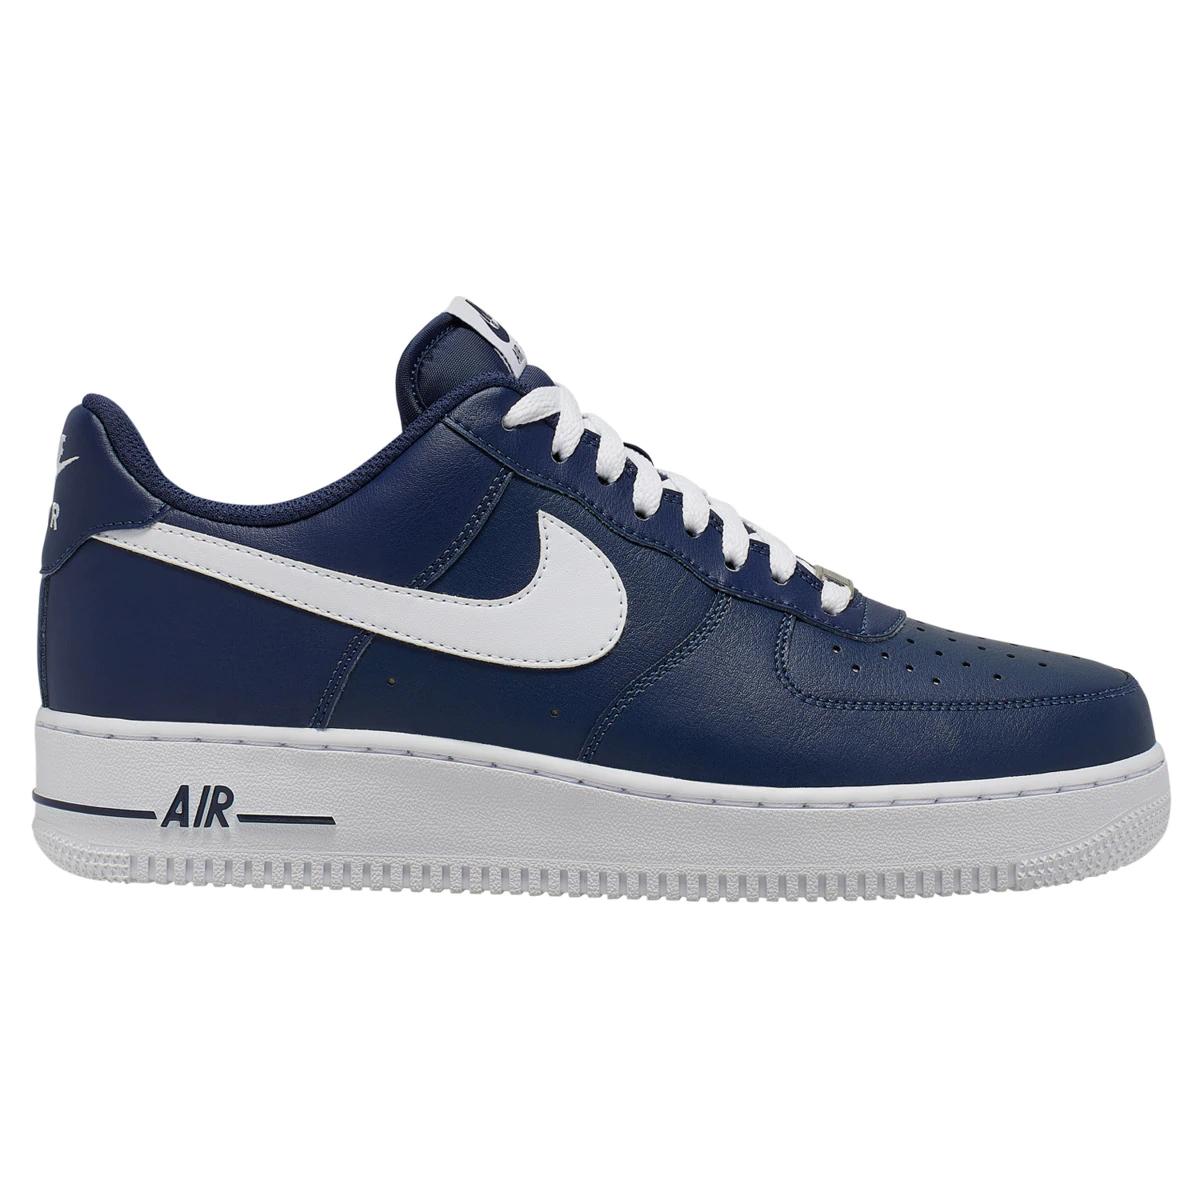 Air force 1 azul marino